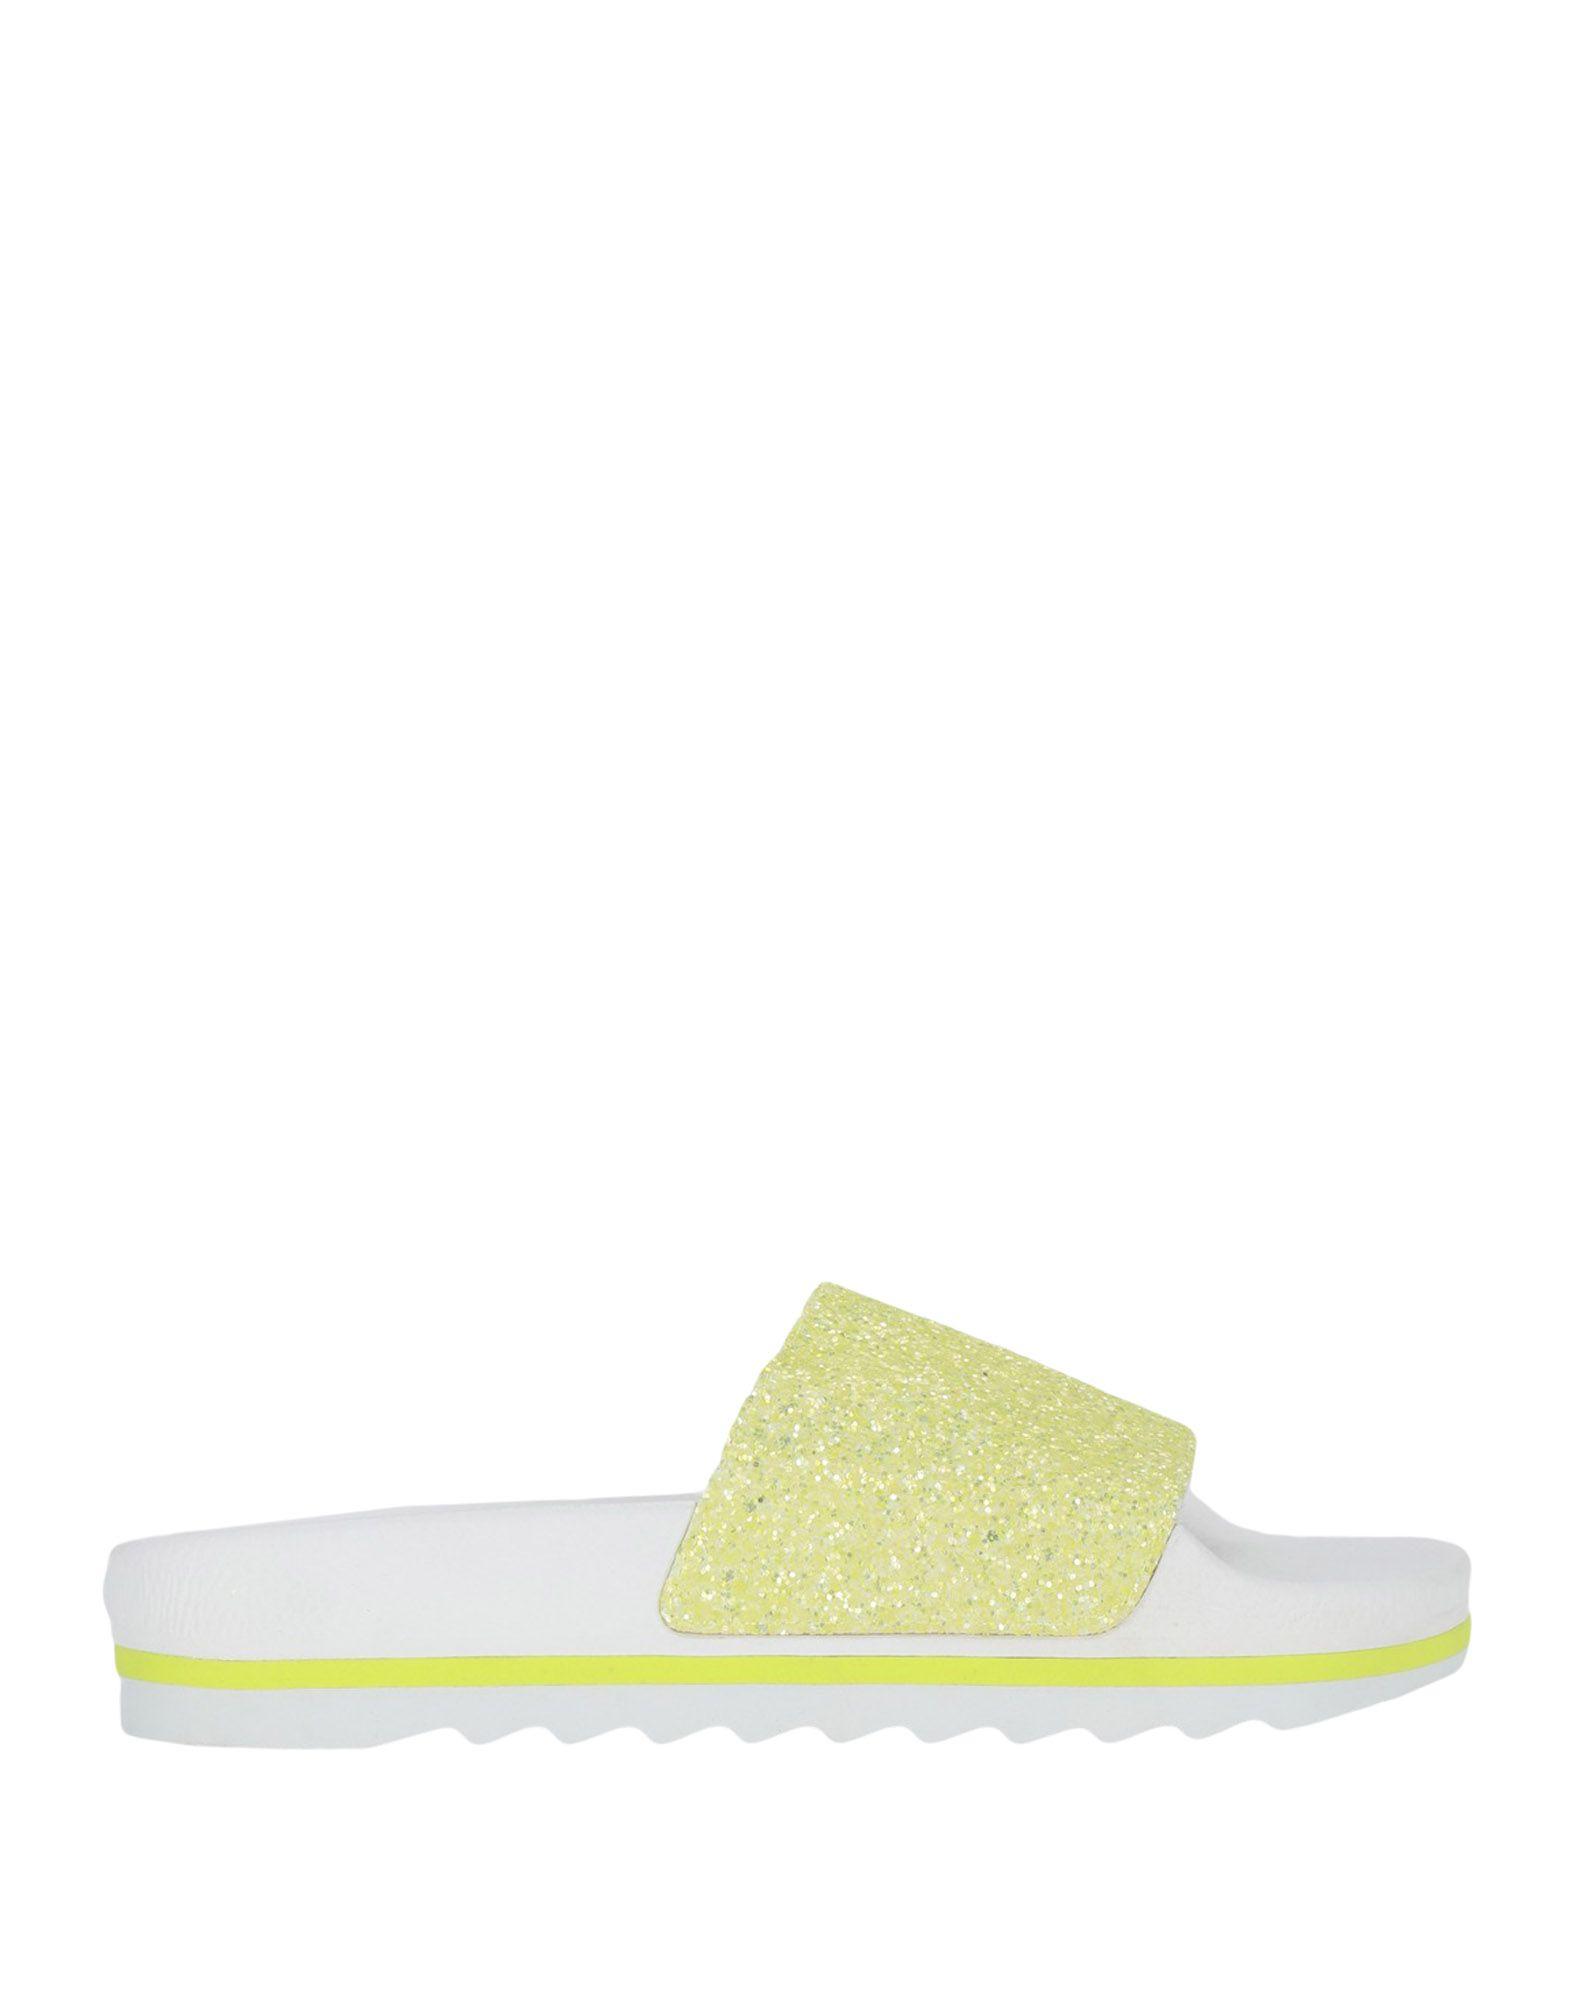 Фото - THE WHITE BRAND® Сандалии the white brand® сандалии